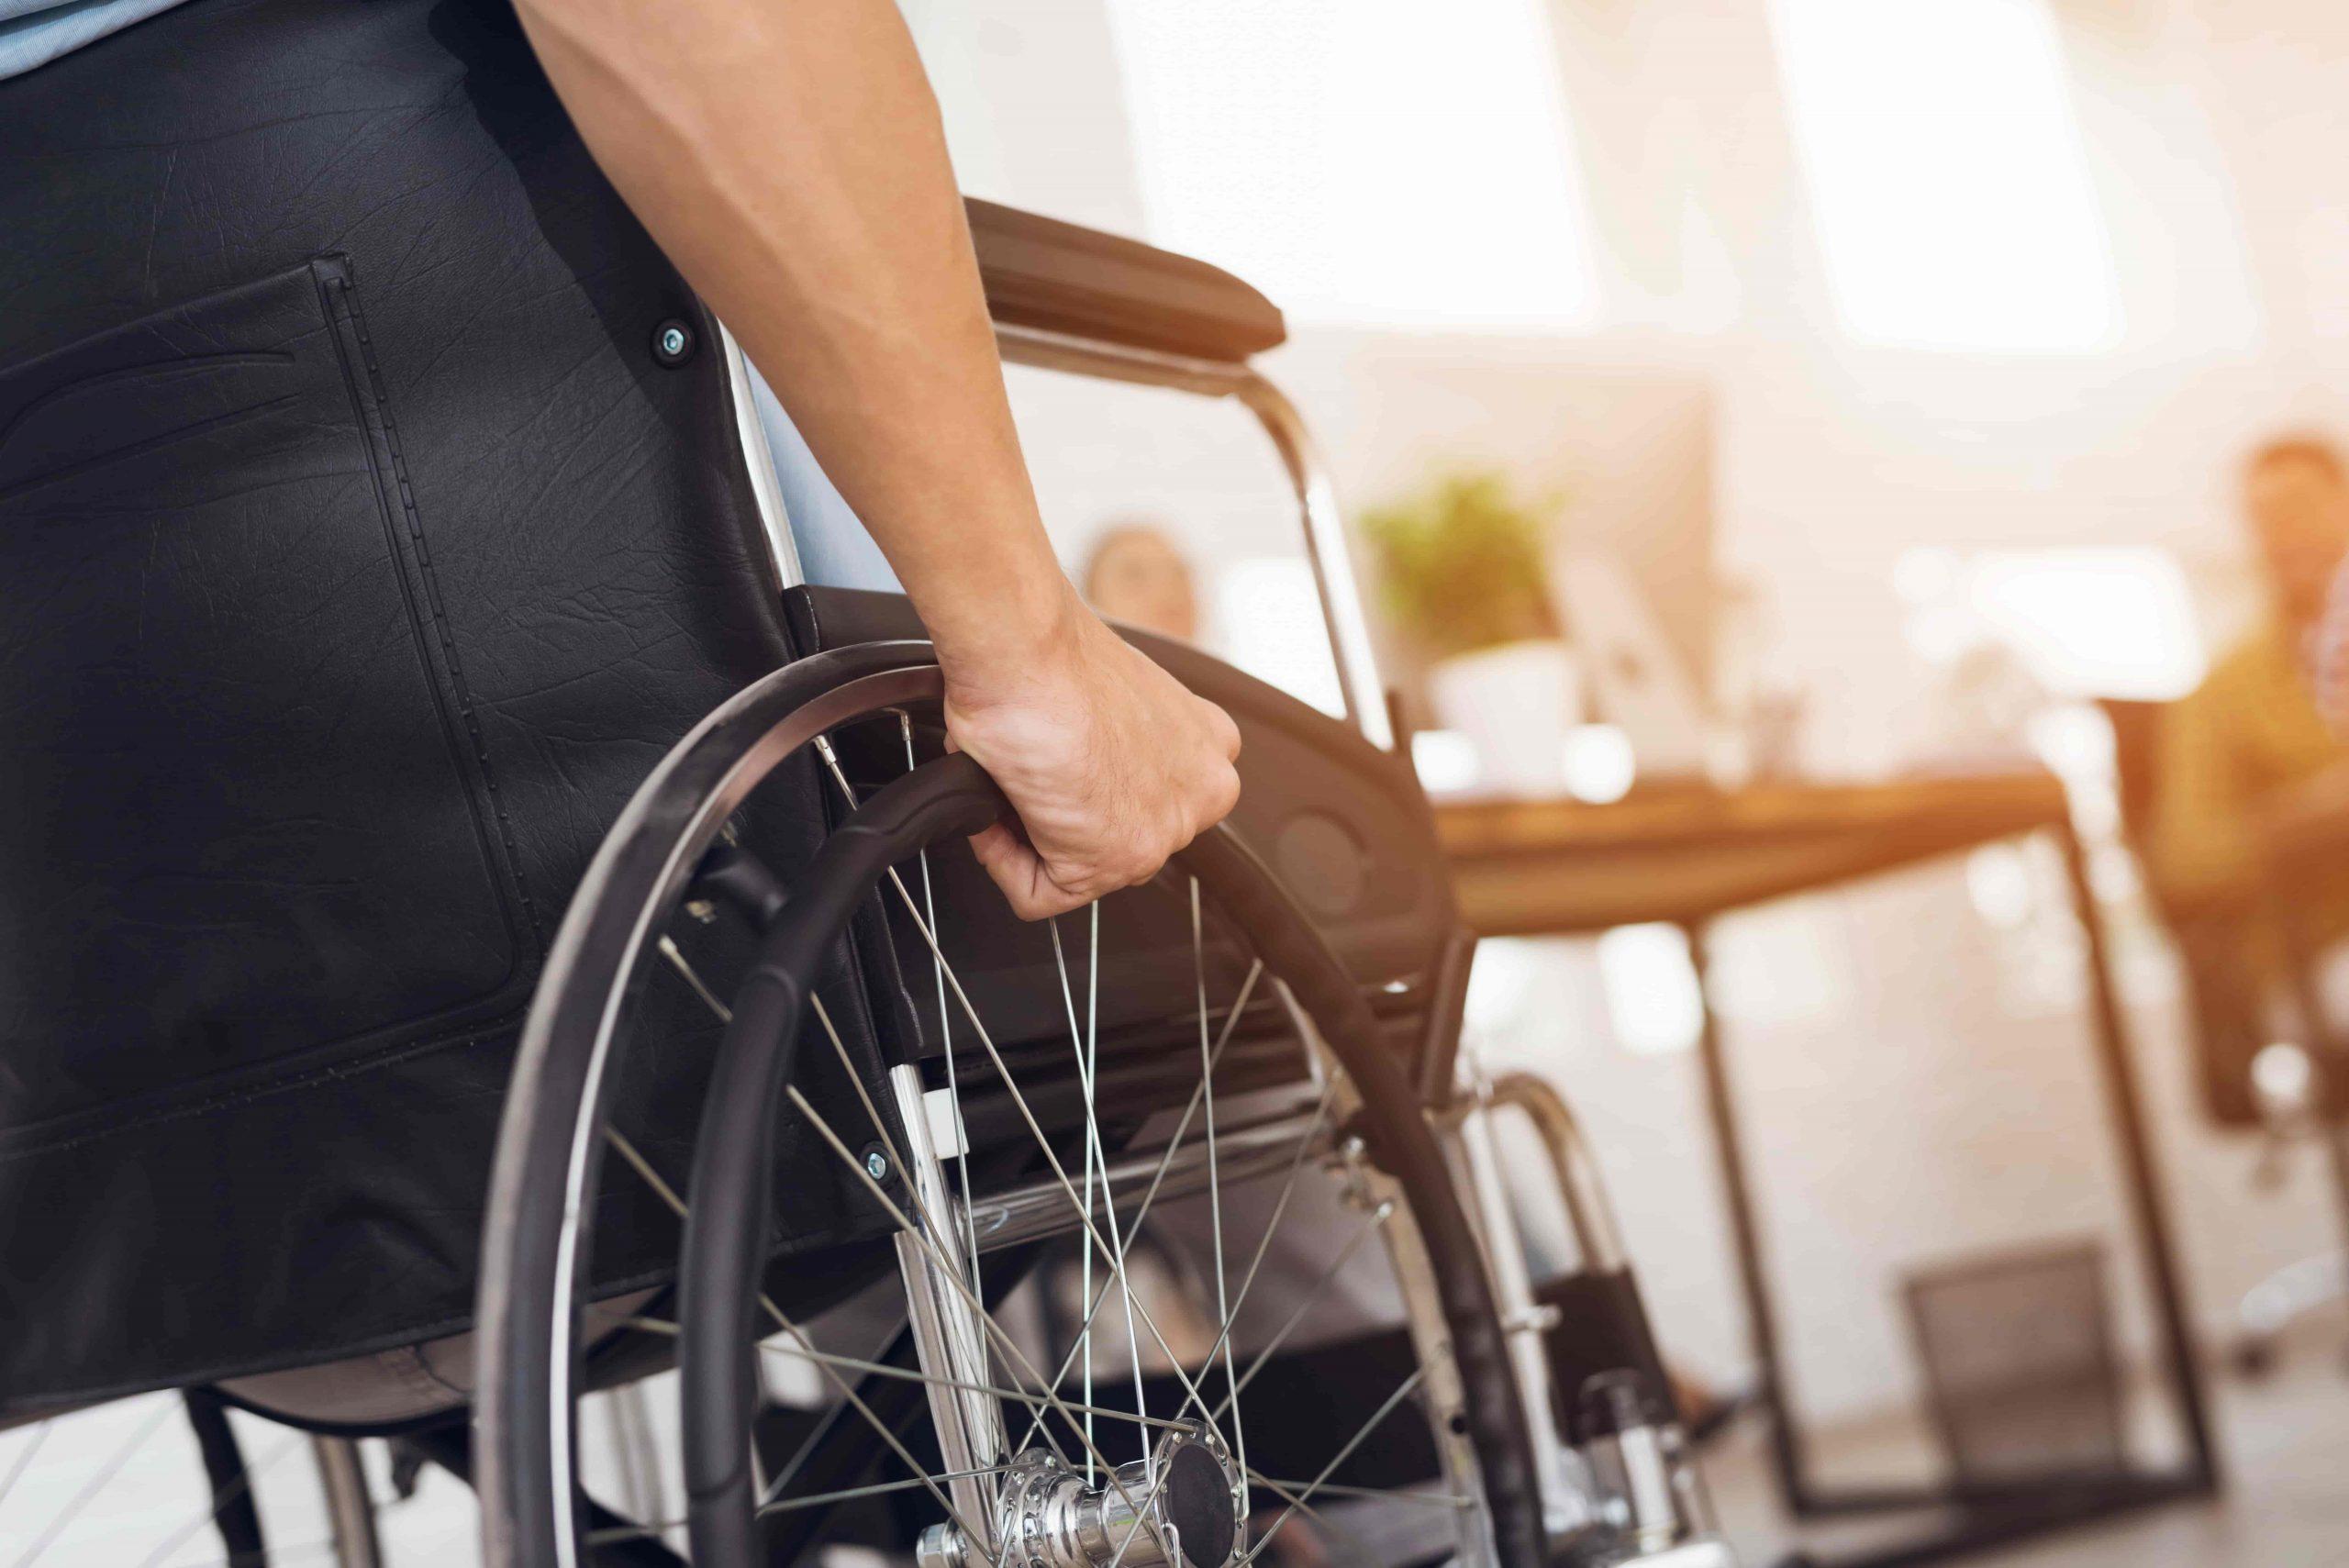 Rouzbeh Pirouz - disability stigma in the workplace